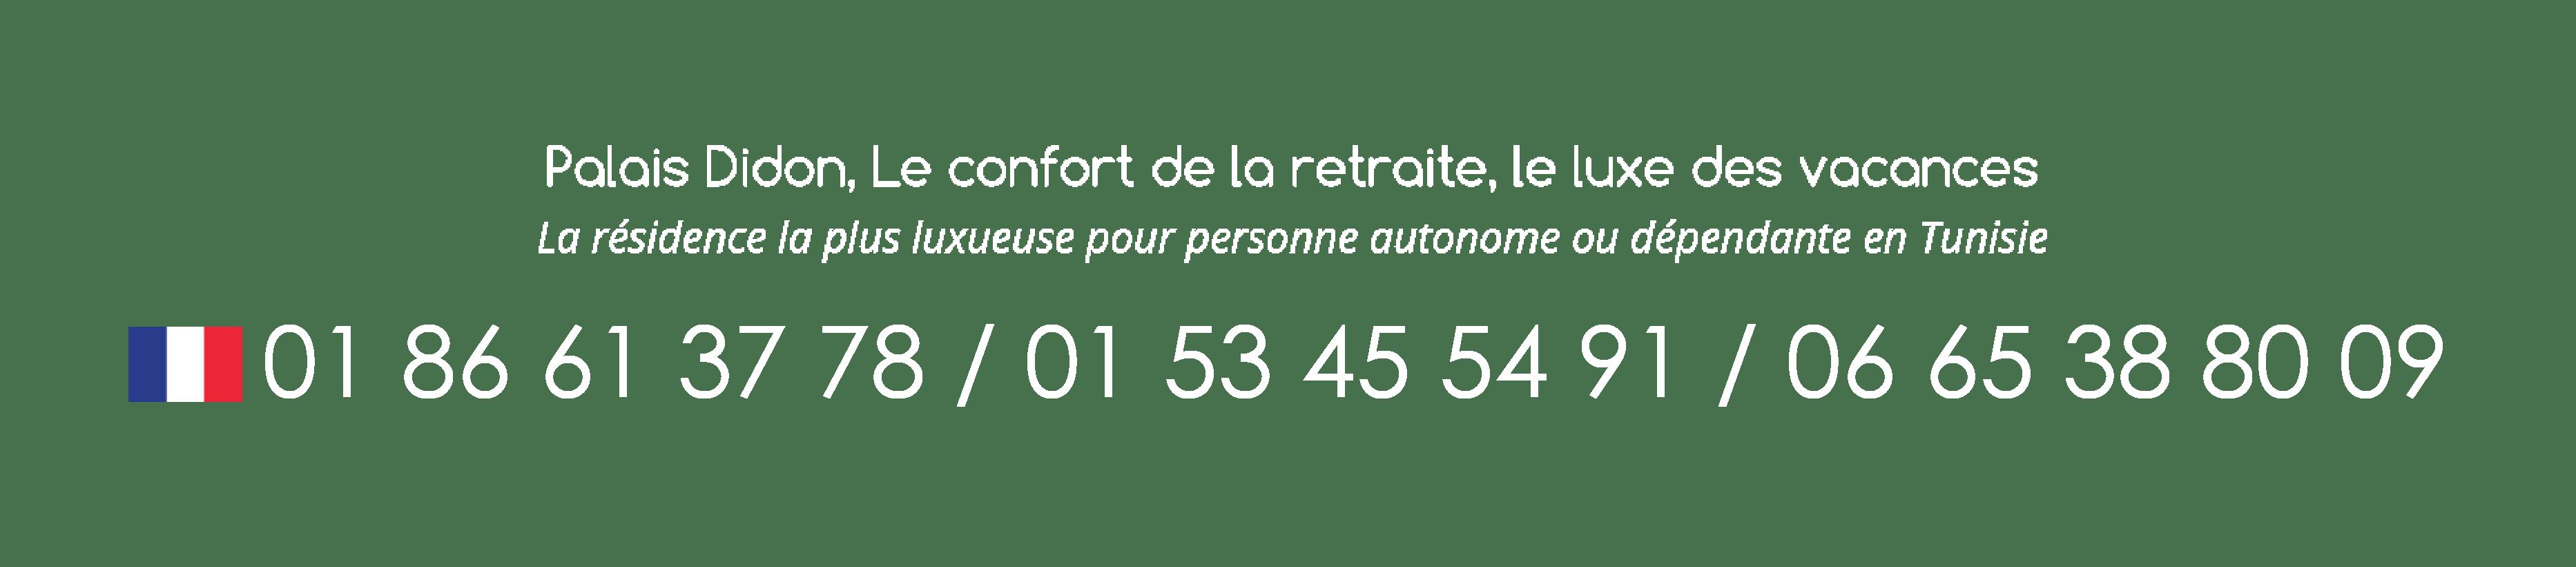 Tel FR DIDON 01 - Le Palais Didon